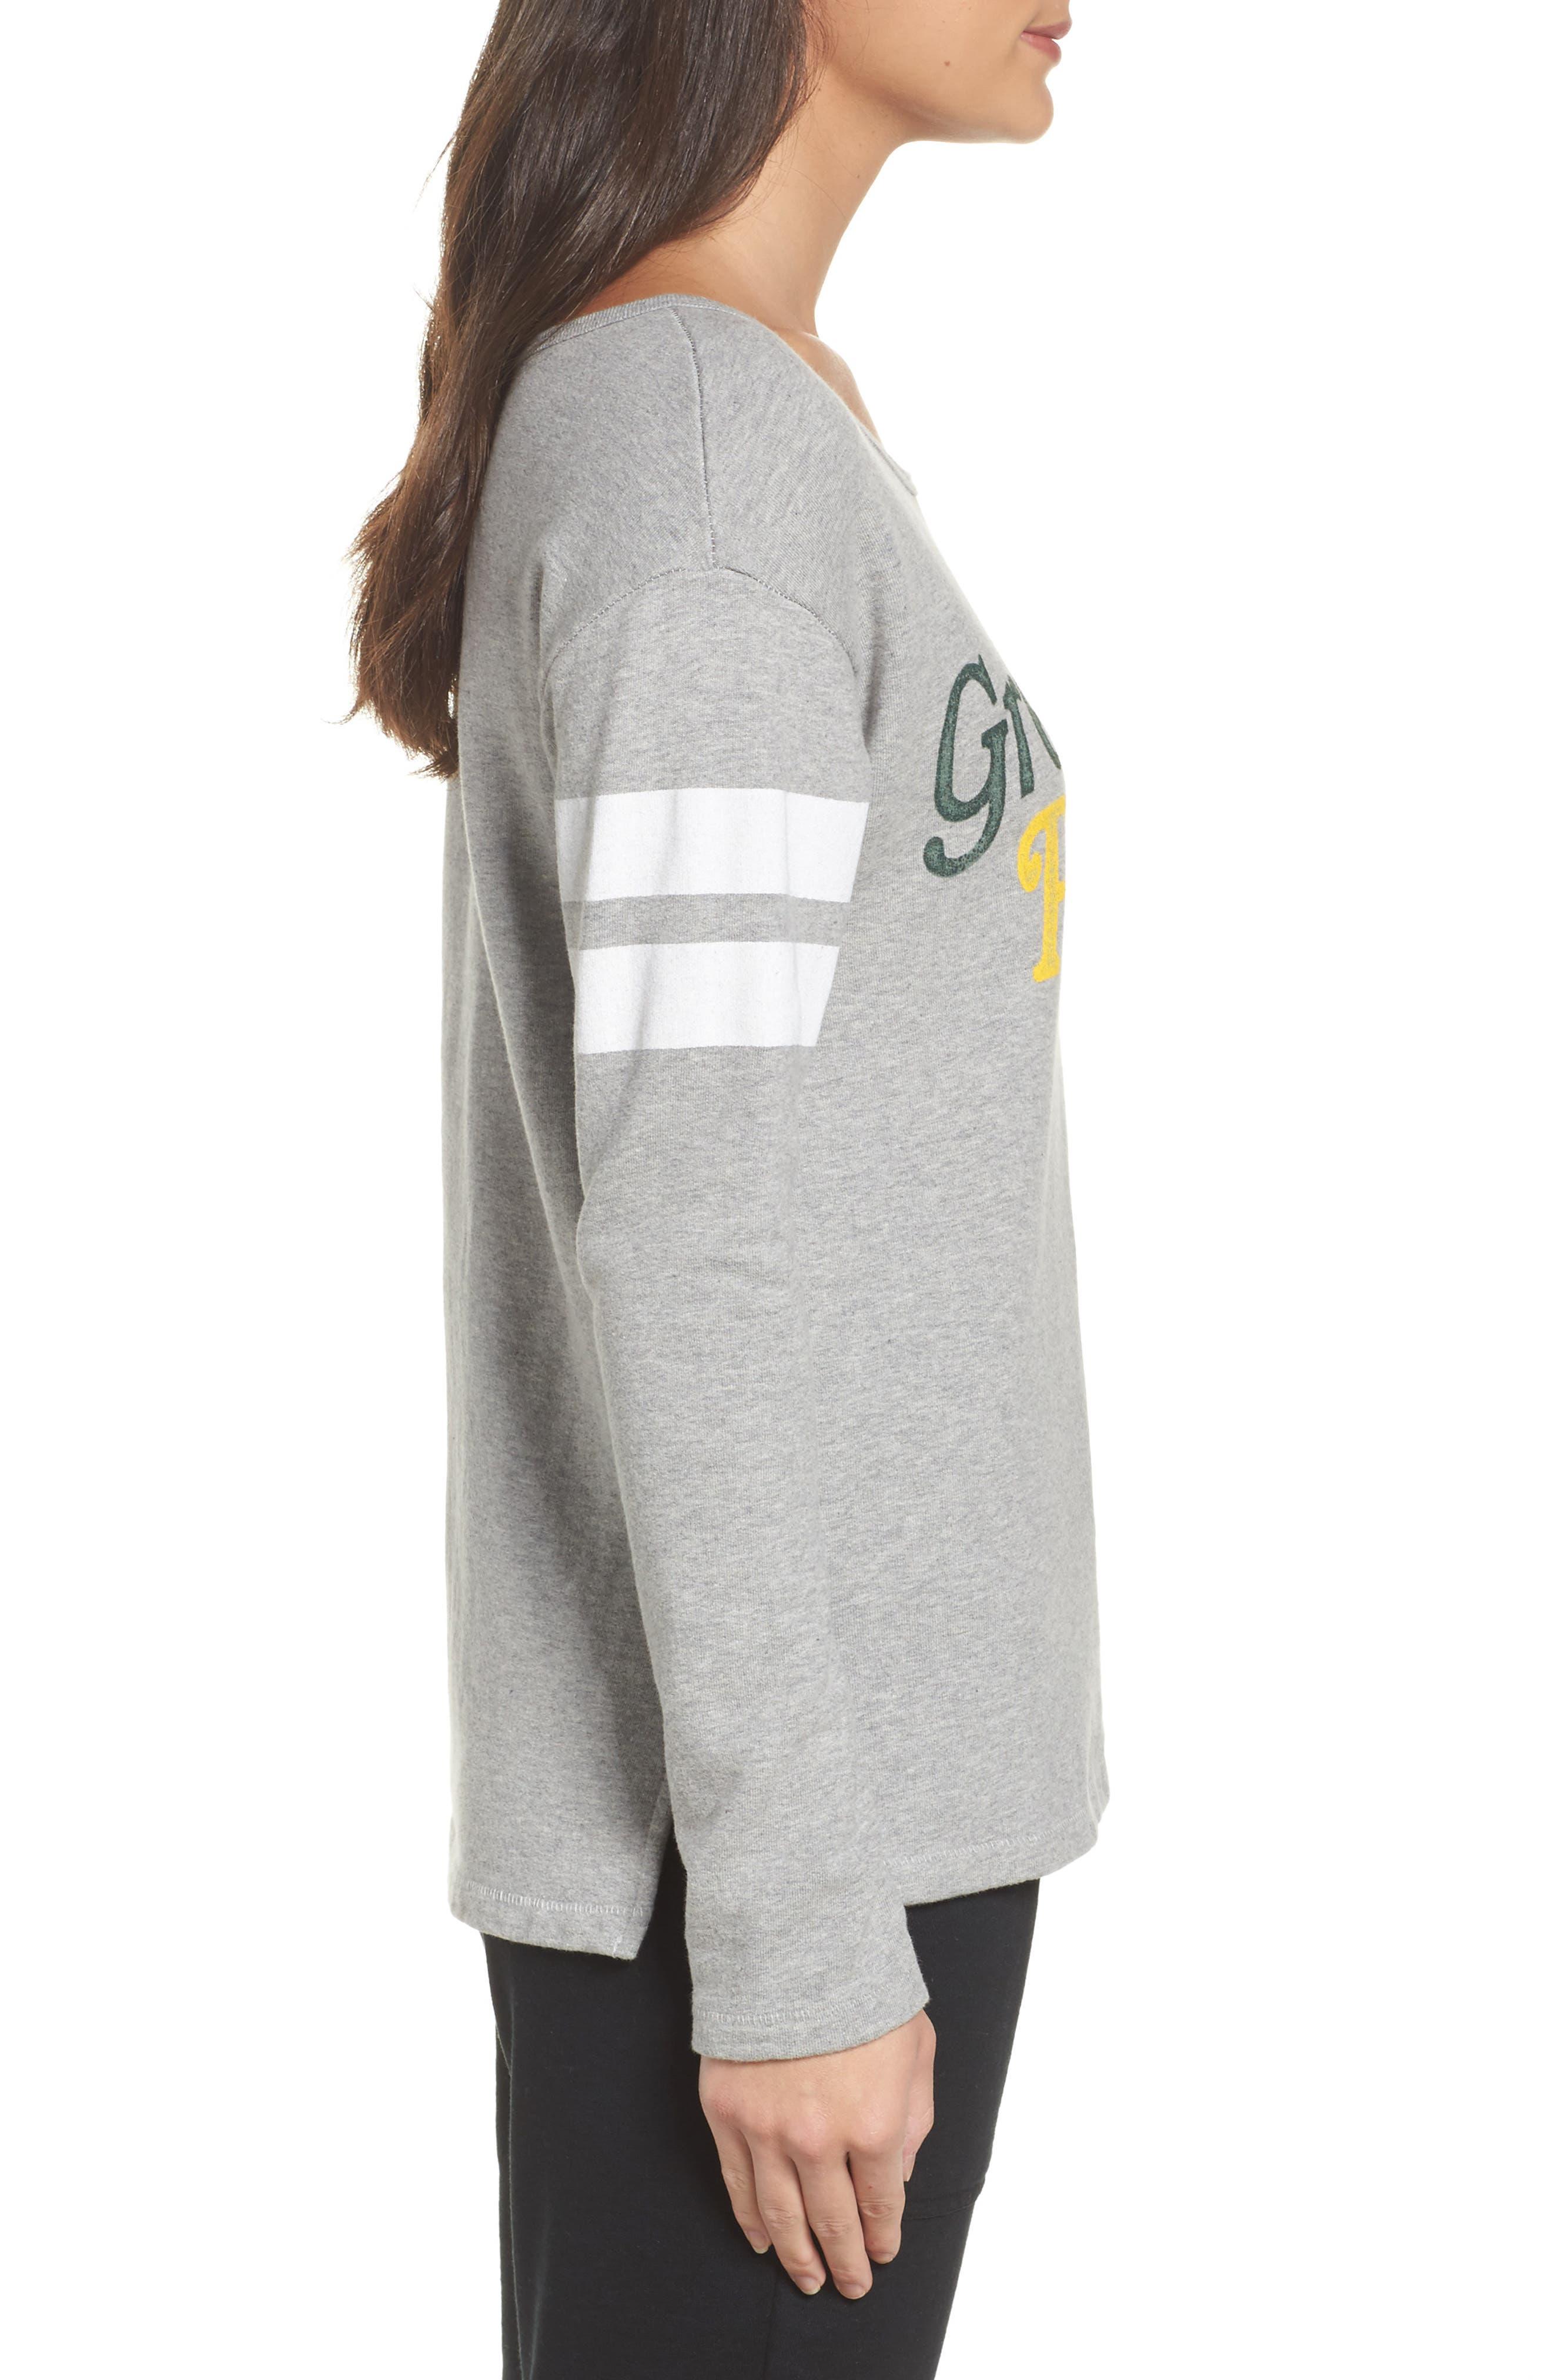 NFL Green Bay Packers Champion Sweatshirt,                             Alternate thumbnail 3, color,                             028